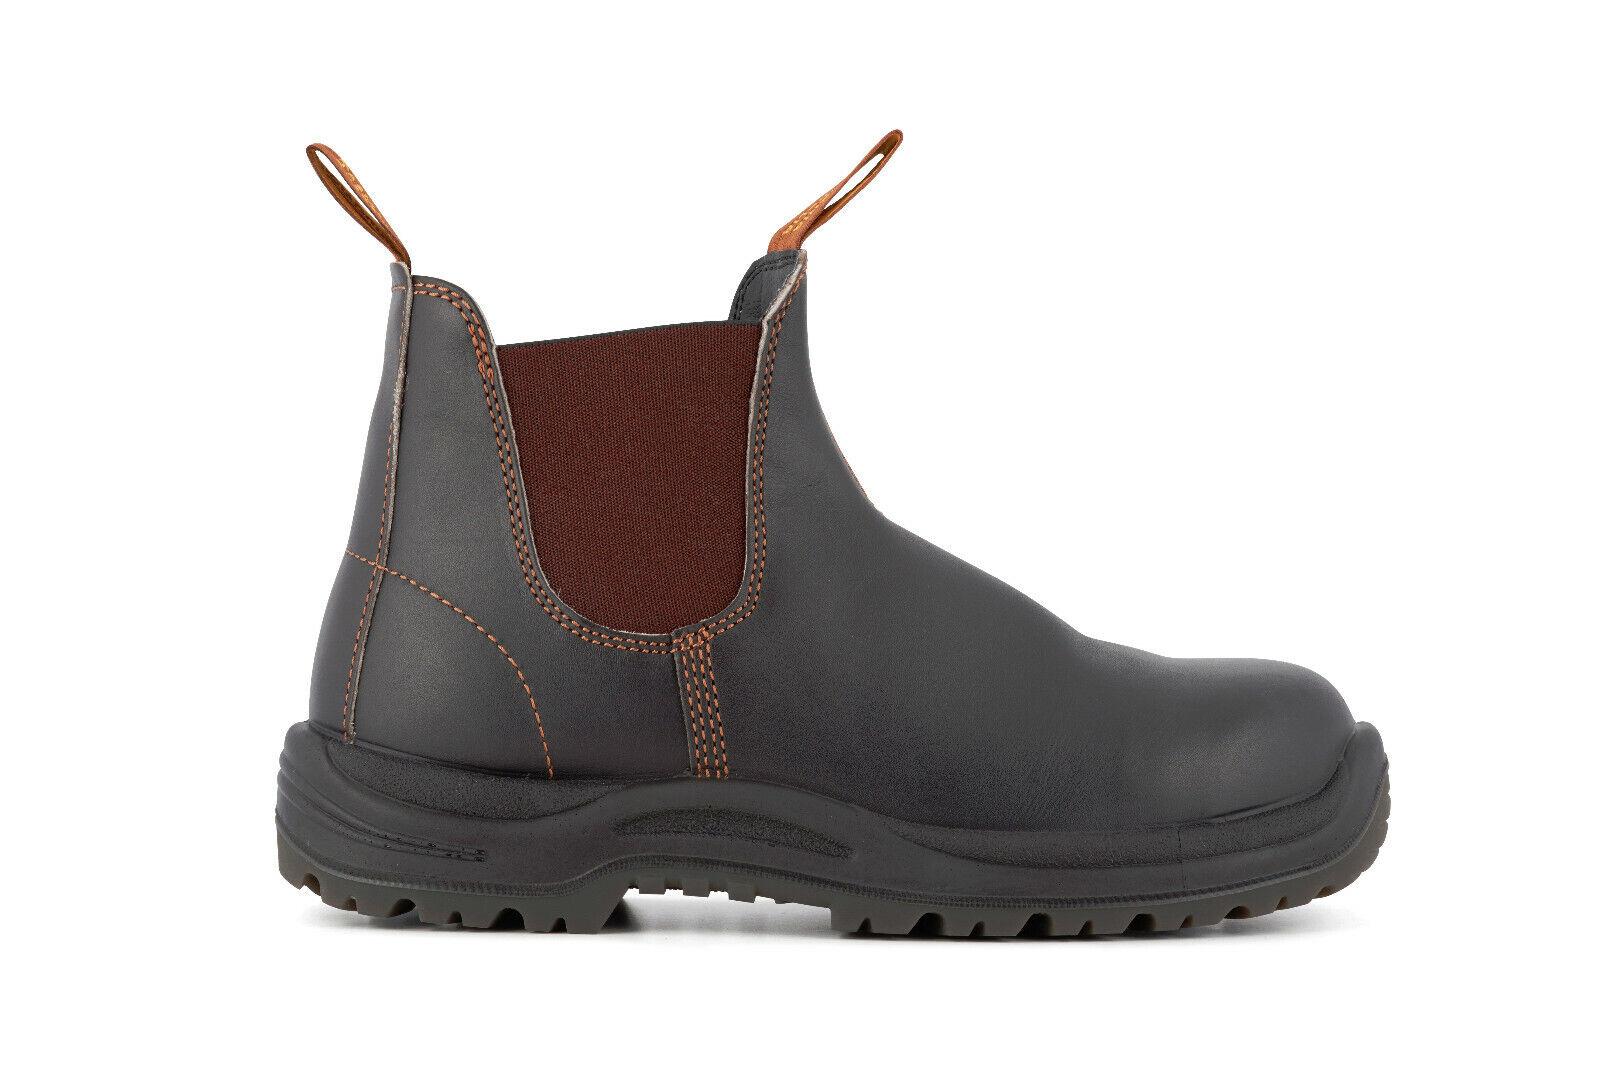 bluendstone 192 Brown Leather SBP Industrial Safety Unisex Chelsea Boot & Midsole